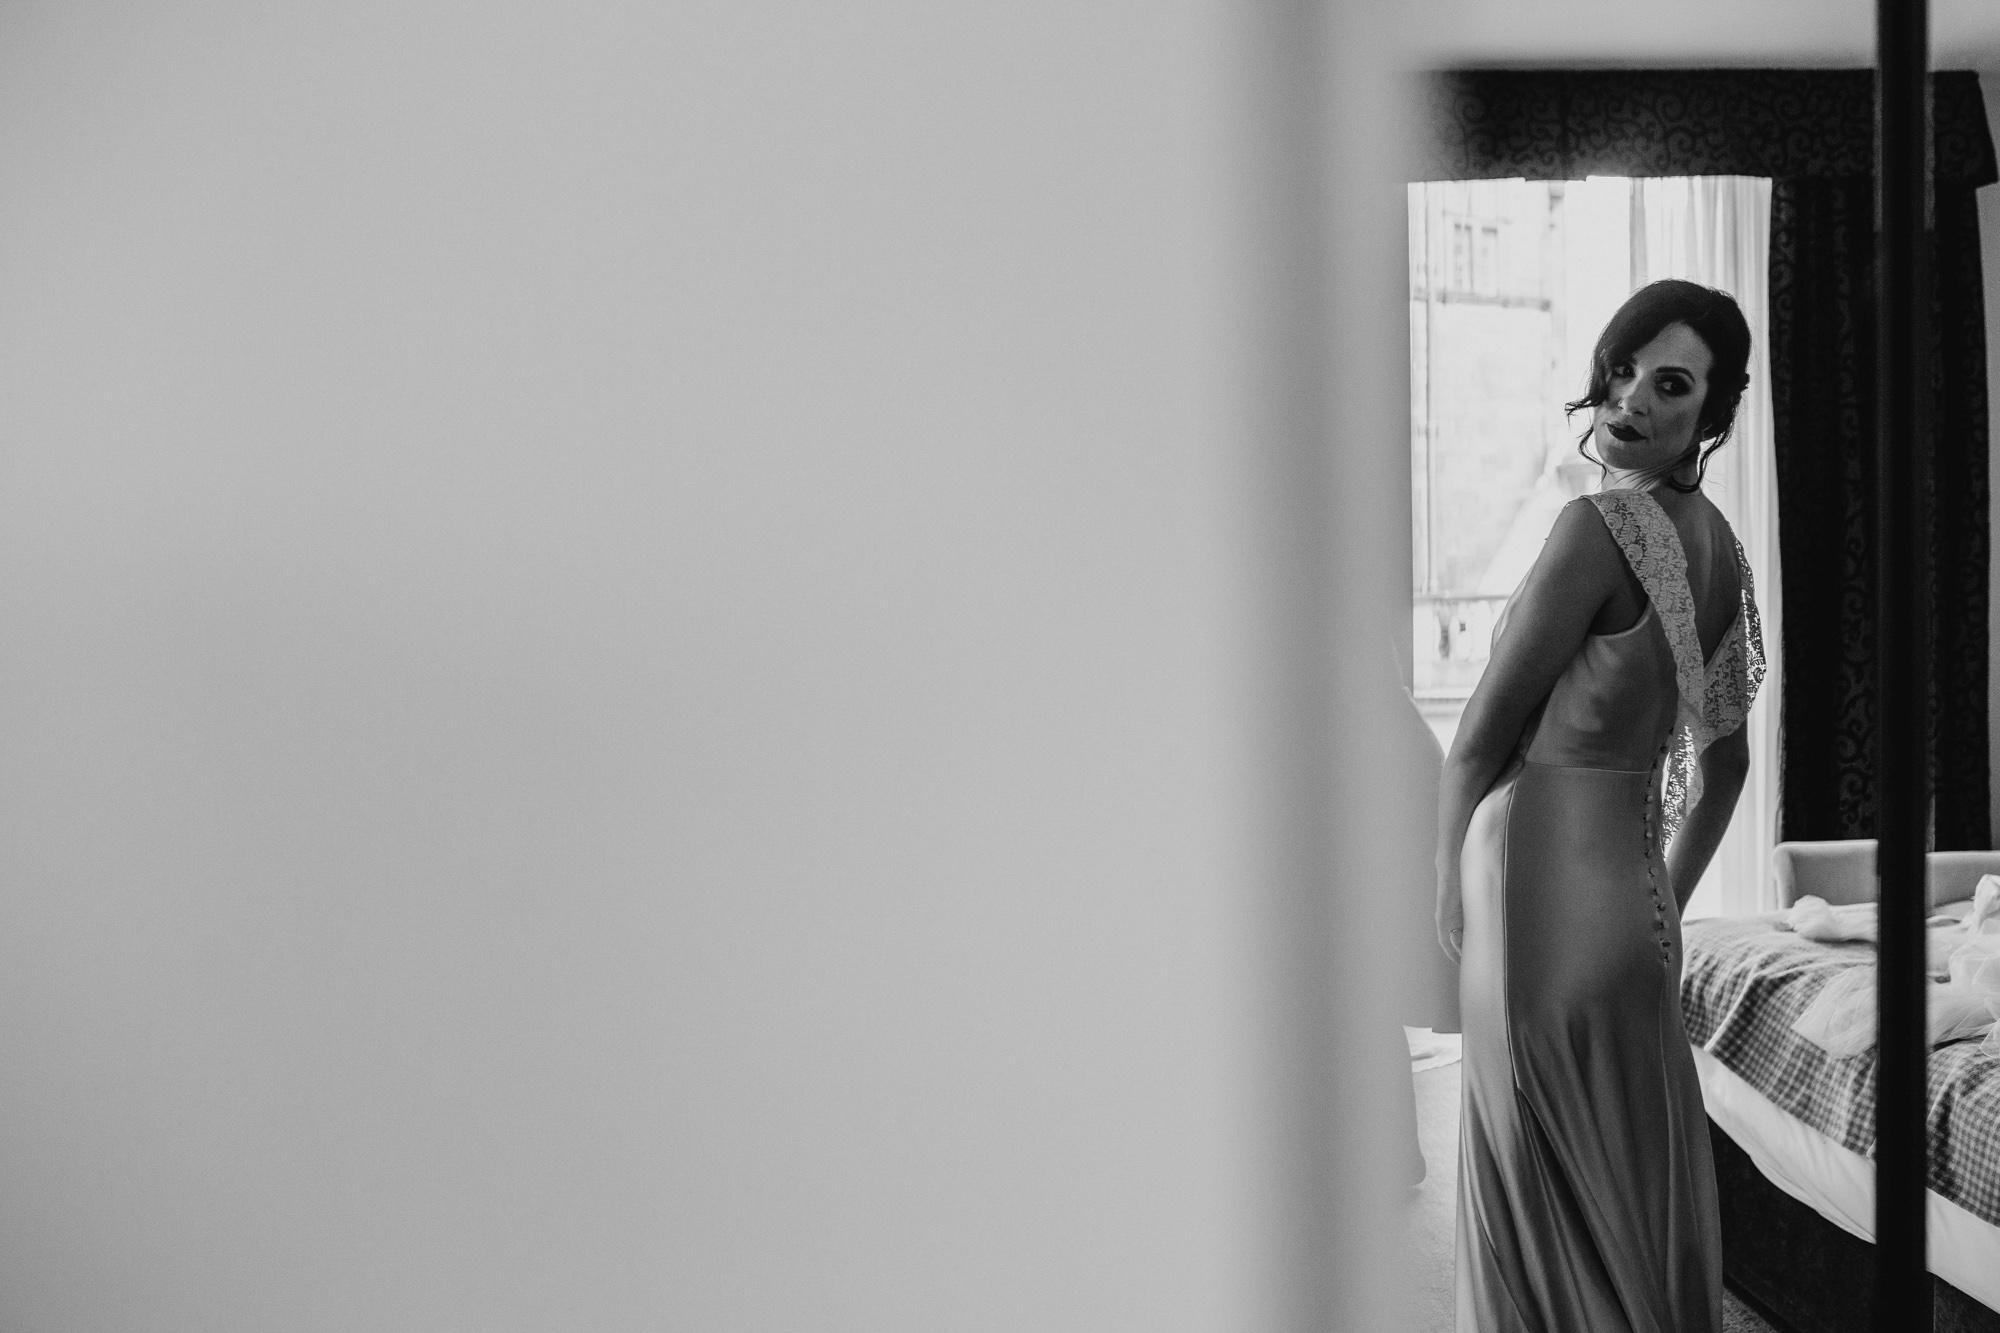 Sarah-Honeysuckle-Bias-Cut-Silk-Vintage-Inspired-Wedding-Gown-Sheffield-Wedding-Kate-Beaumont-3.jpg